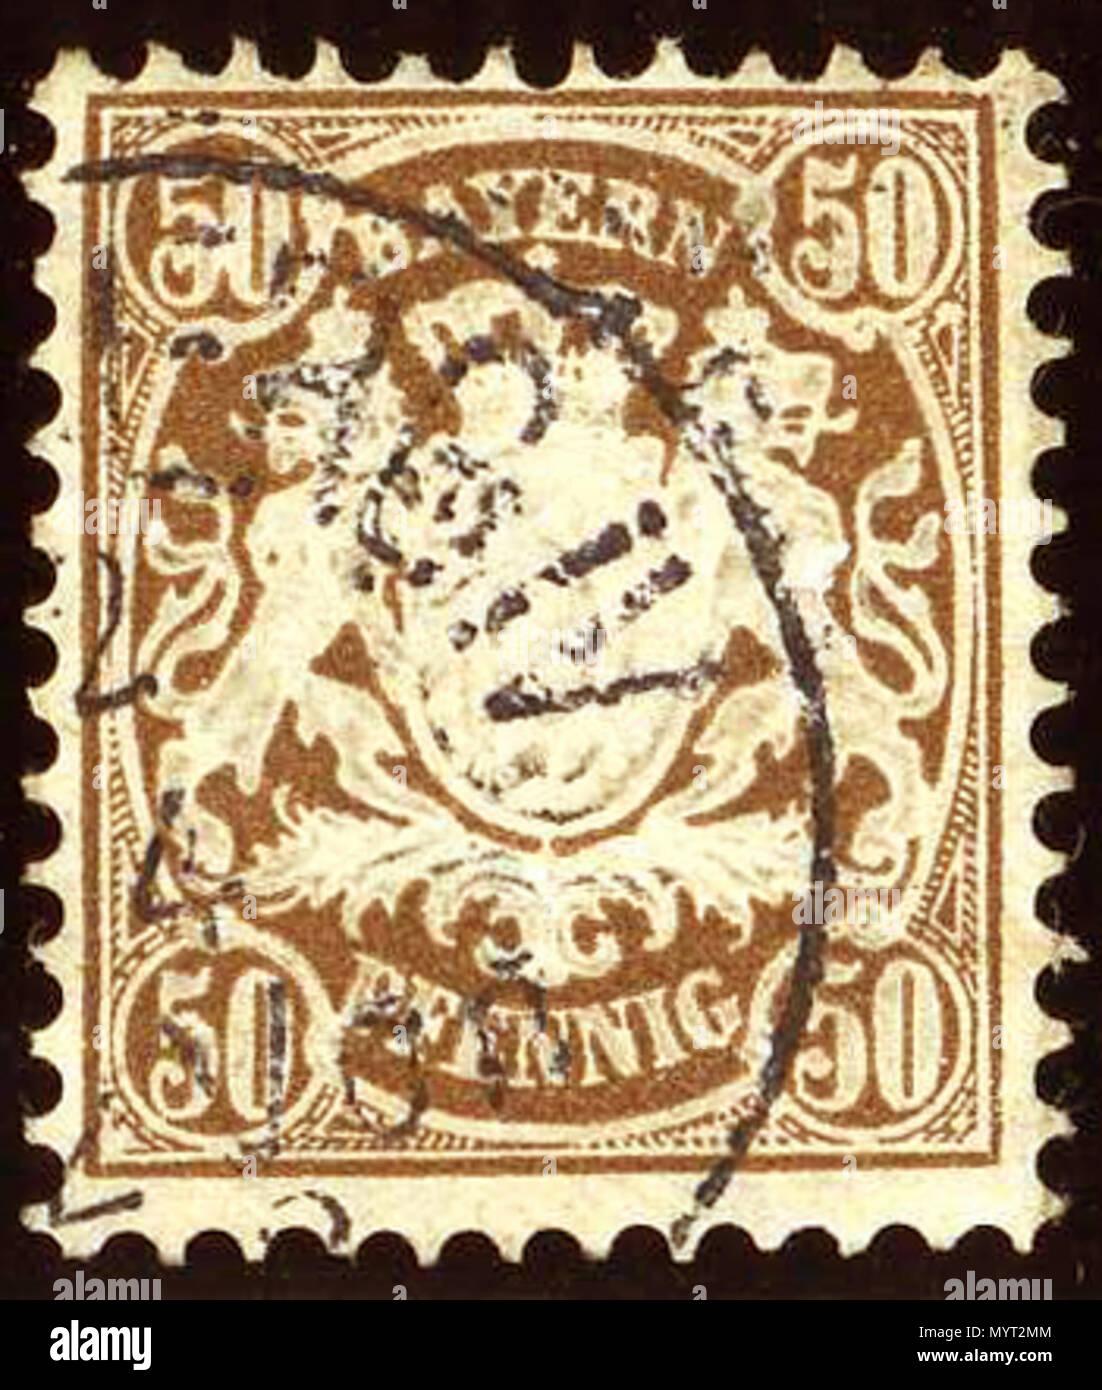 . English: 50 Pfennig deep brown, Kingdom of Bavaria issue 1881. Cancelled at NURENBERG (?) IV. Michel N°52.  . 9 December 2016, 21:21:07. Jacquesverlaeken 1 1881issue 50Pfg Bayern Mi52 - Stock Image